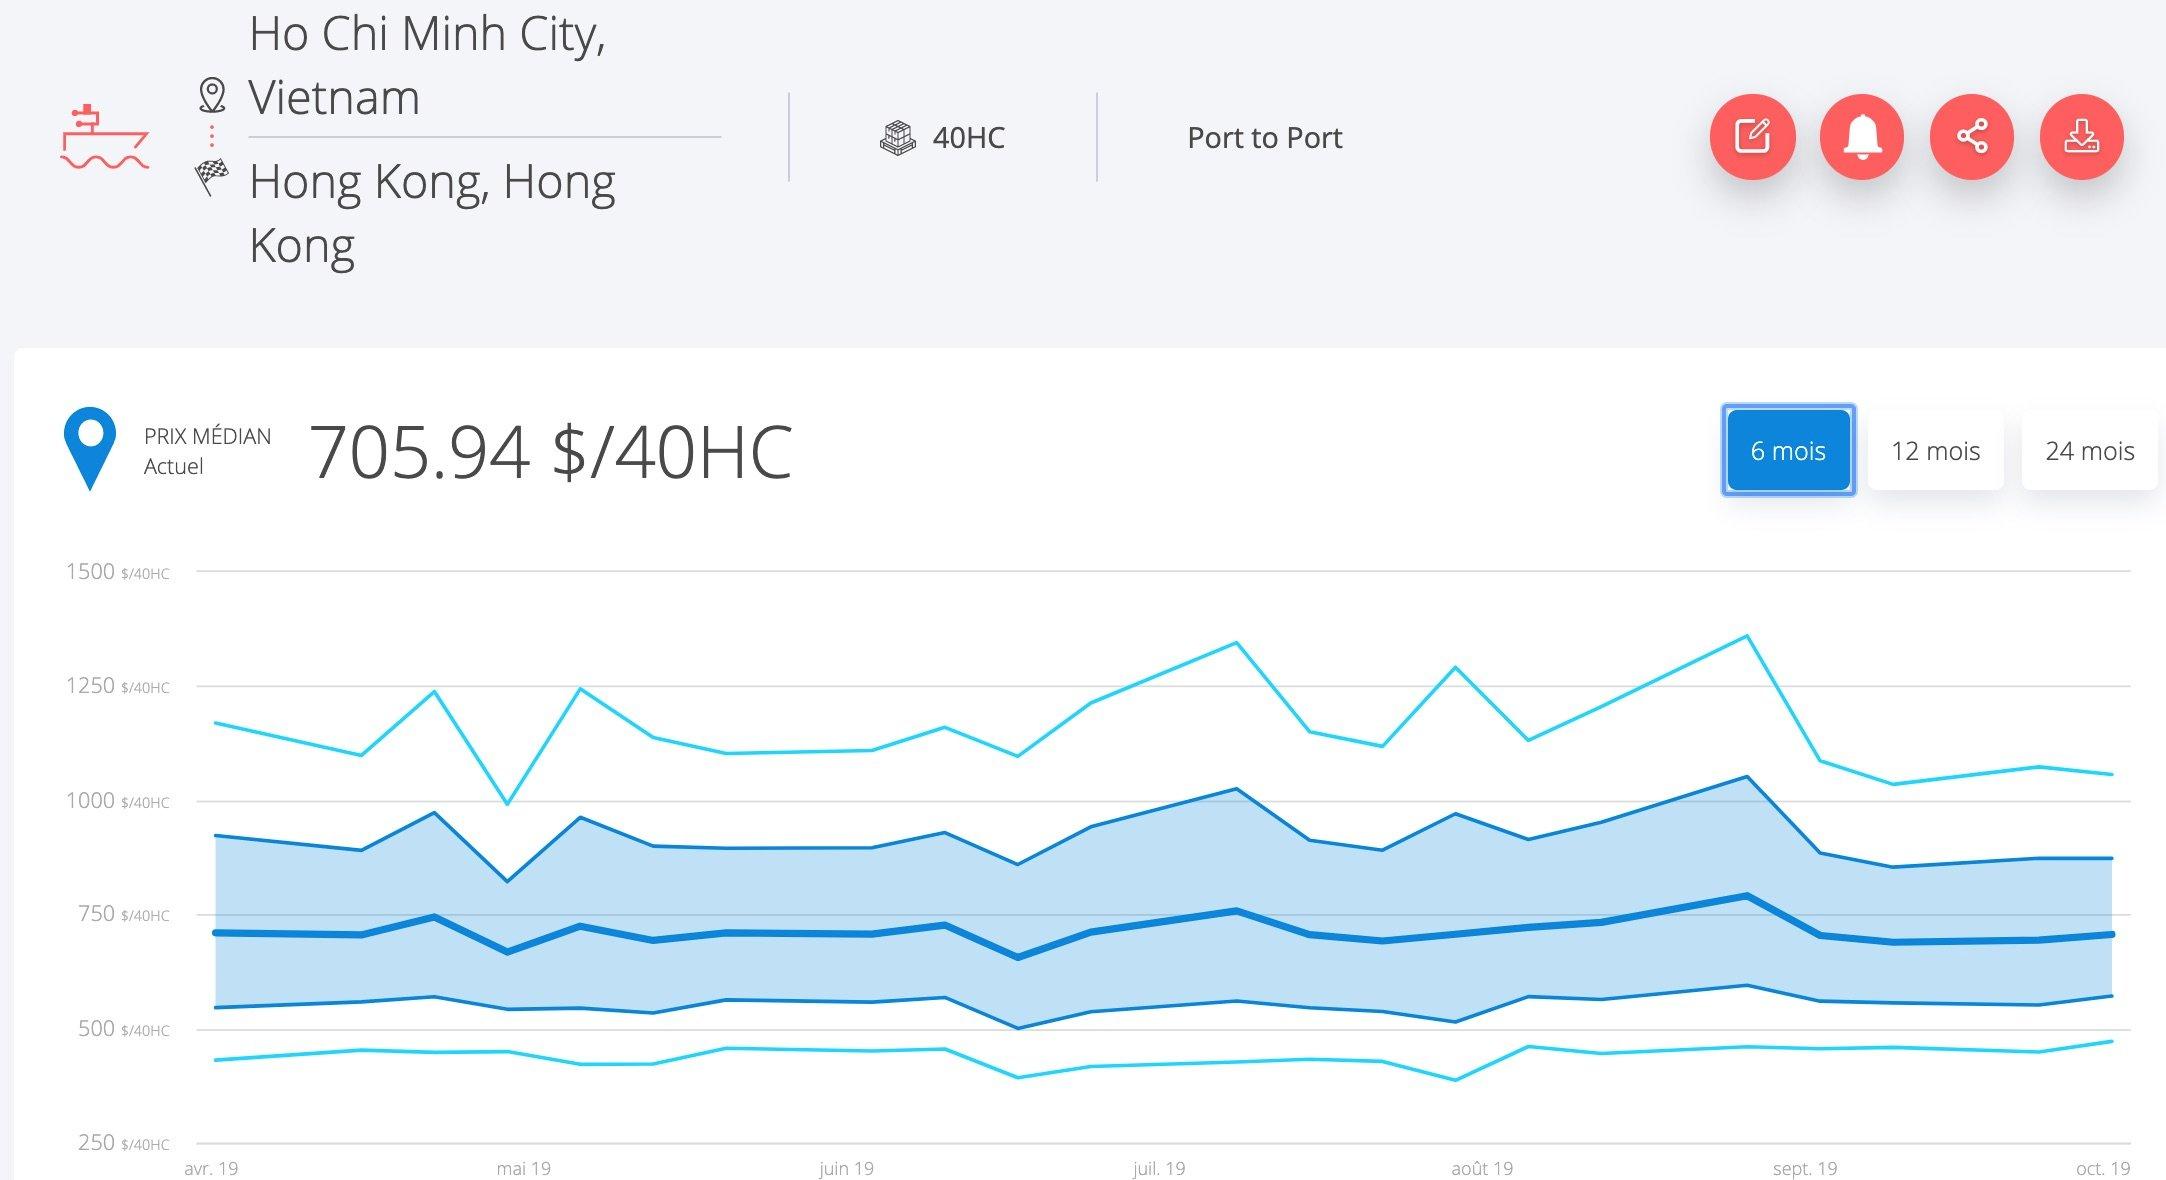 taux-fret-vietnam-chine-novembre-2019